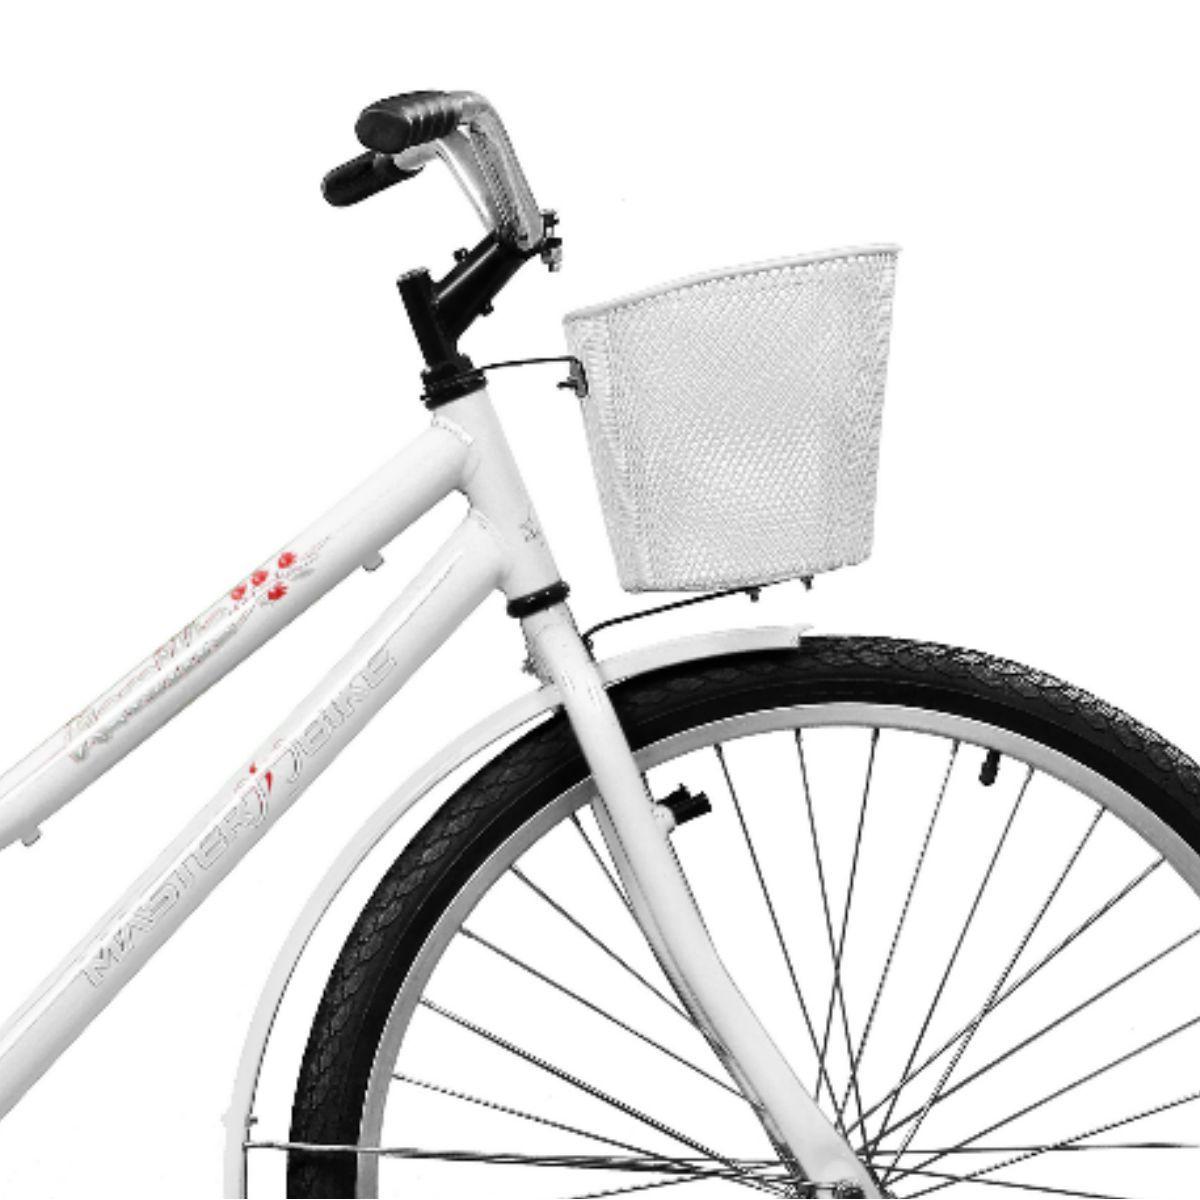 Bicicleta Master Bike Aro 26 Kamilla Contrapedal c/ Cesta Branco